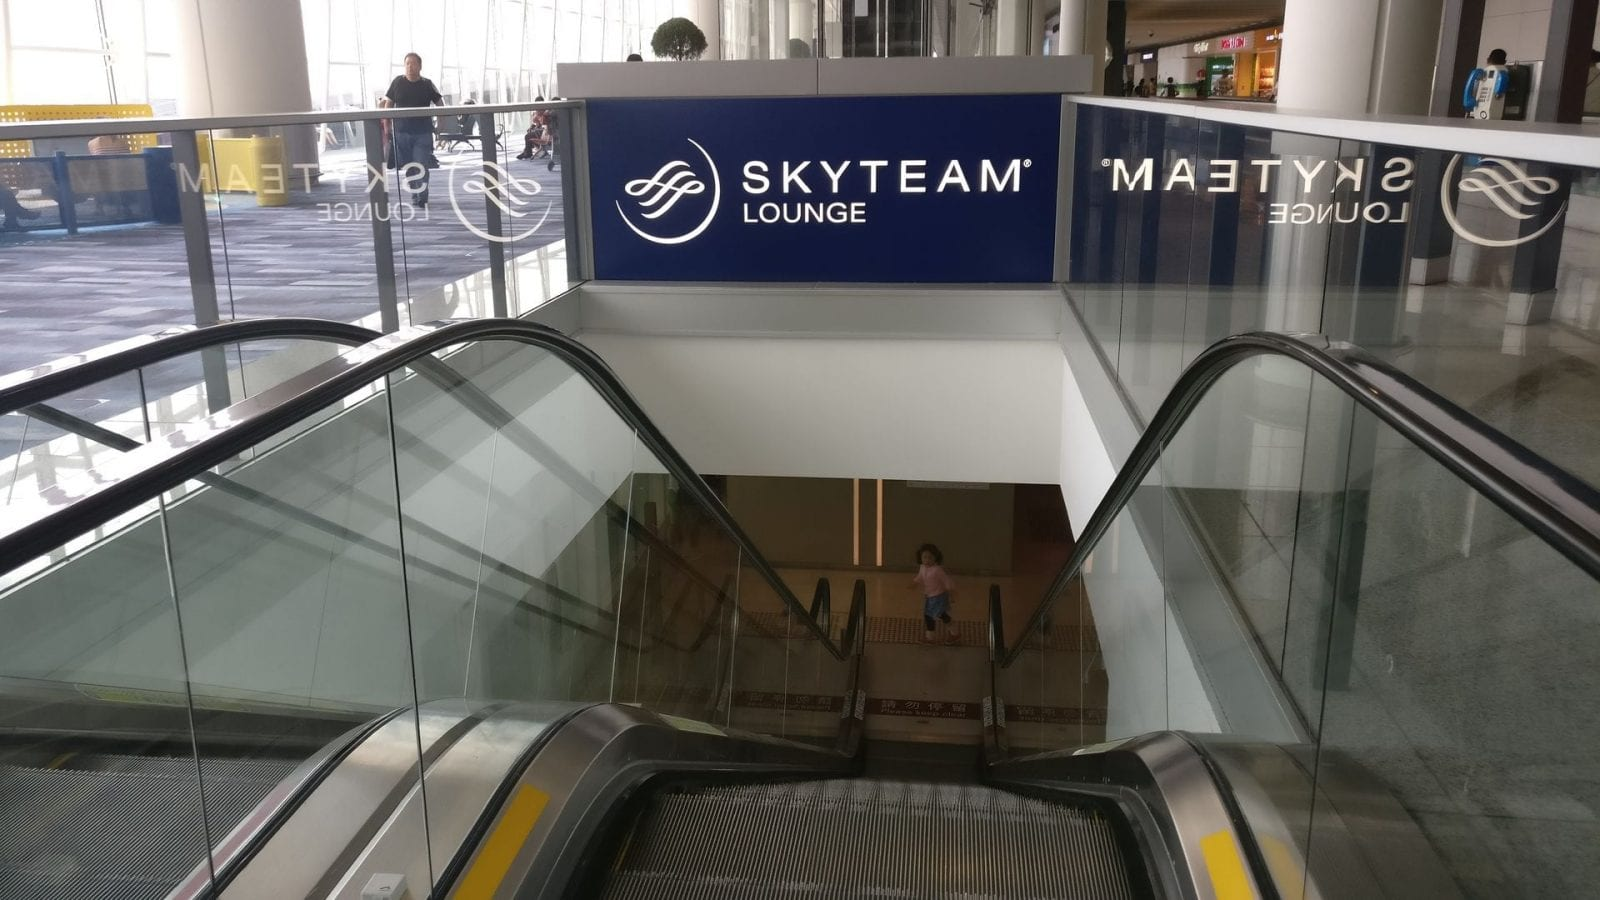 Comment obtenir le statut SkyTeam Elite Plus